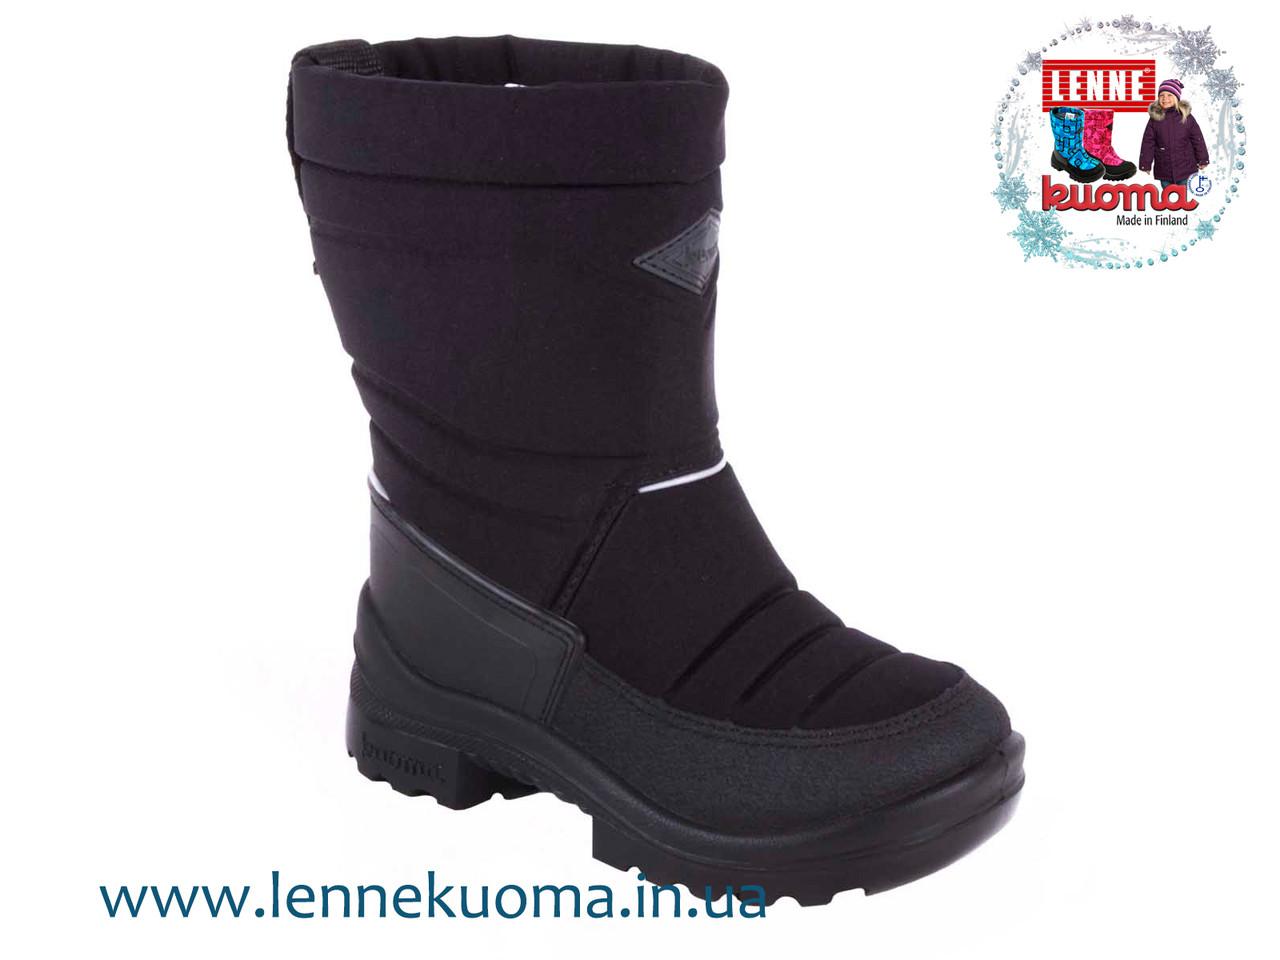 KUOMA Putkivarsi  Black. Размеры 25-29